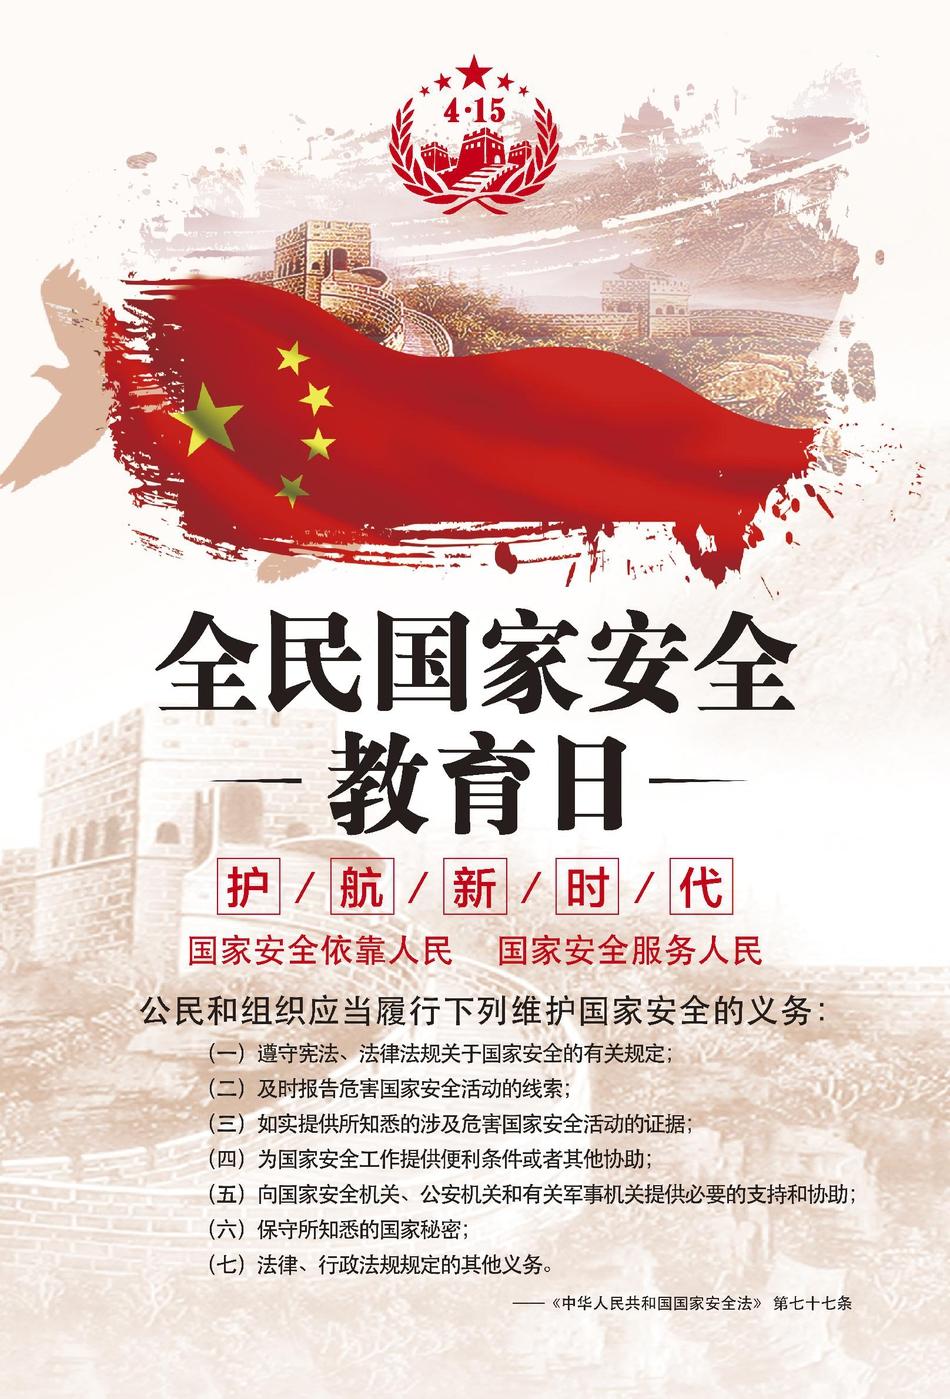 http://bbs.7bah.com/news/5.html?kw=红网郴州新闻